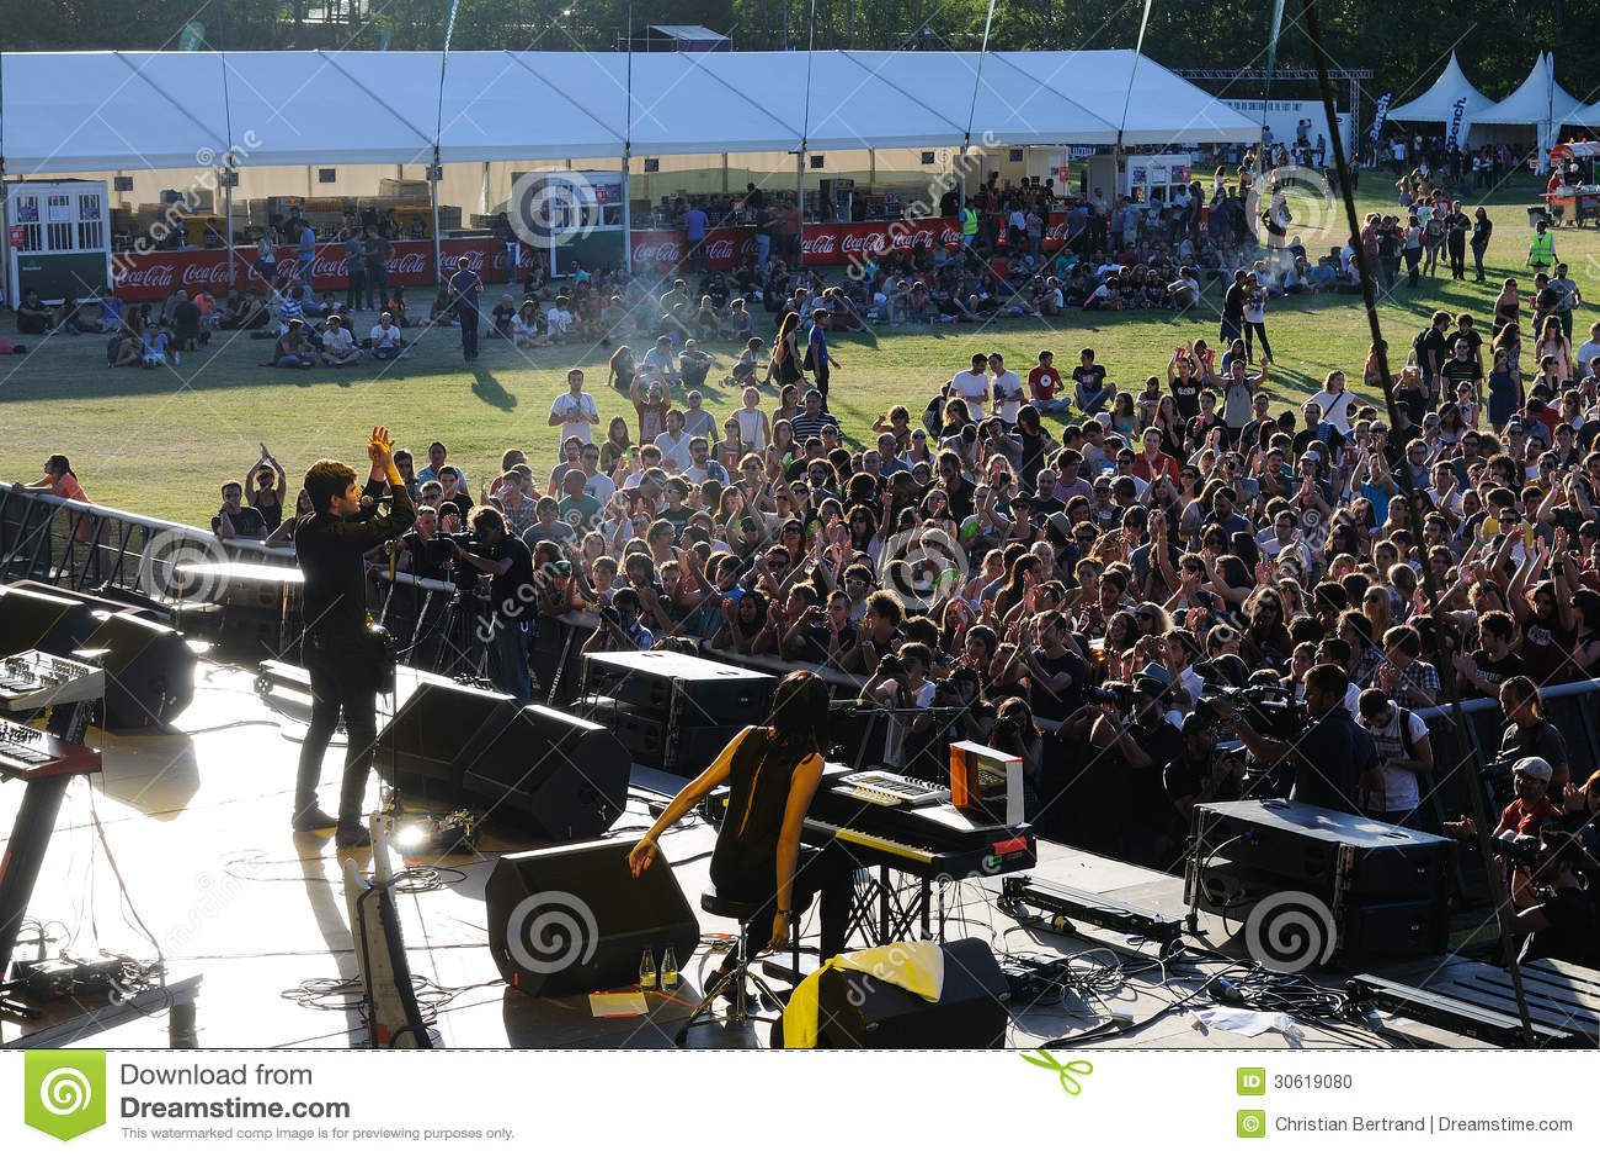 La banda de Dorian se realiza en el festival de Dcode.